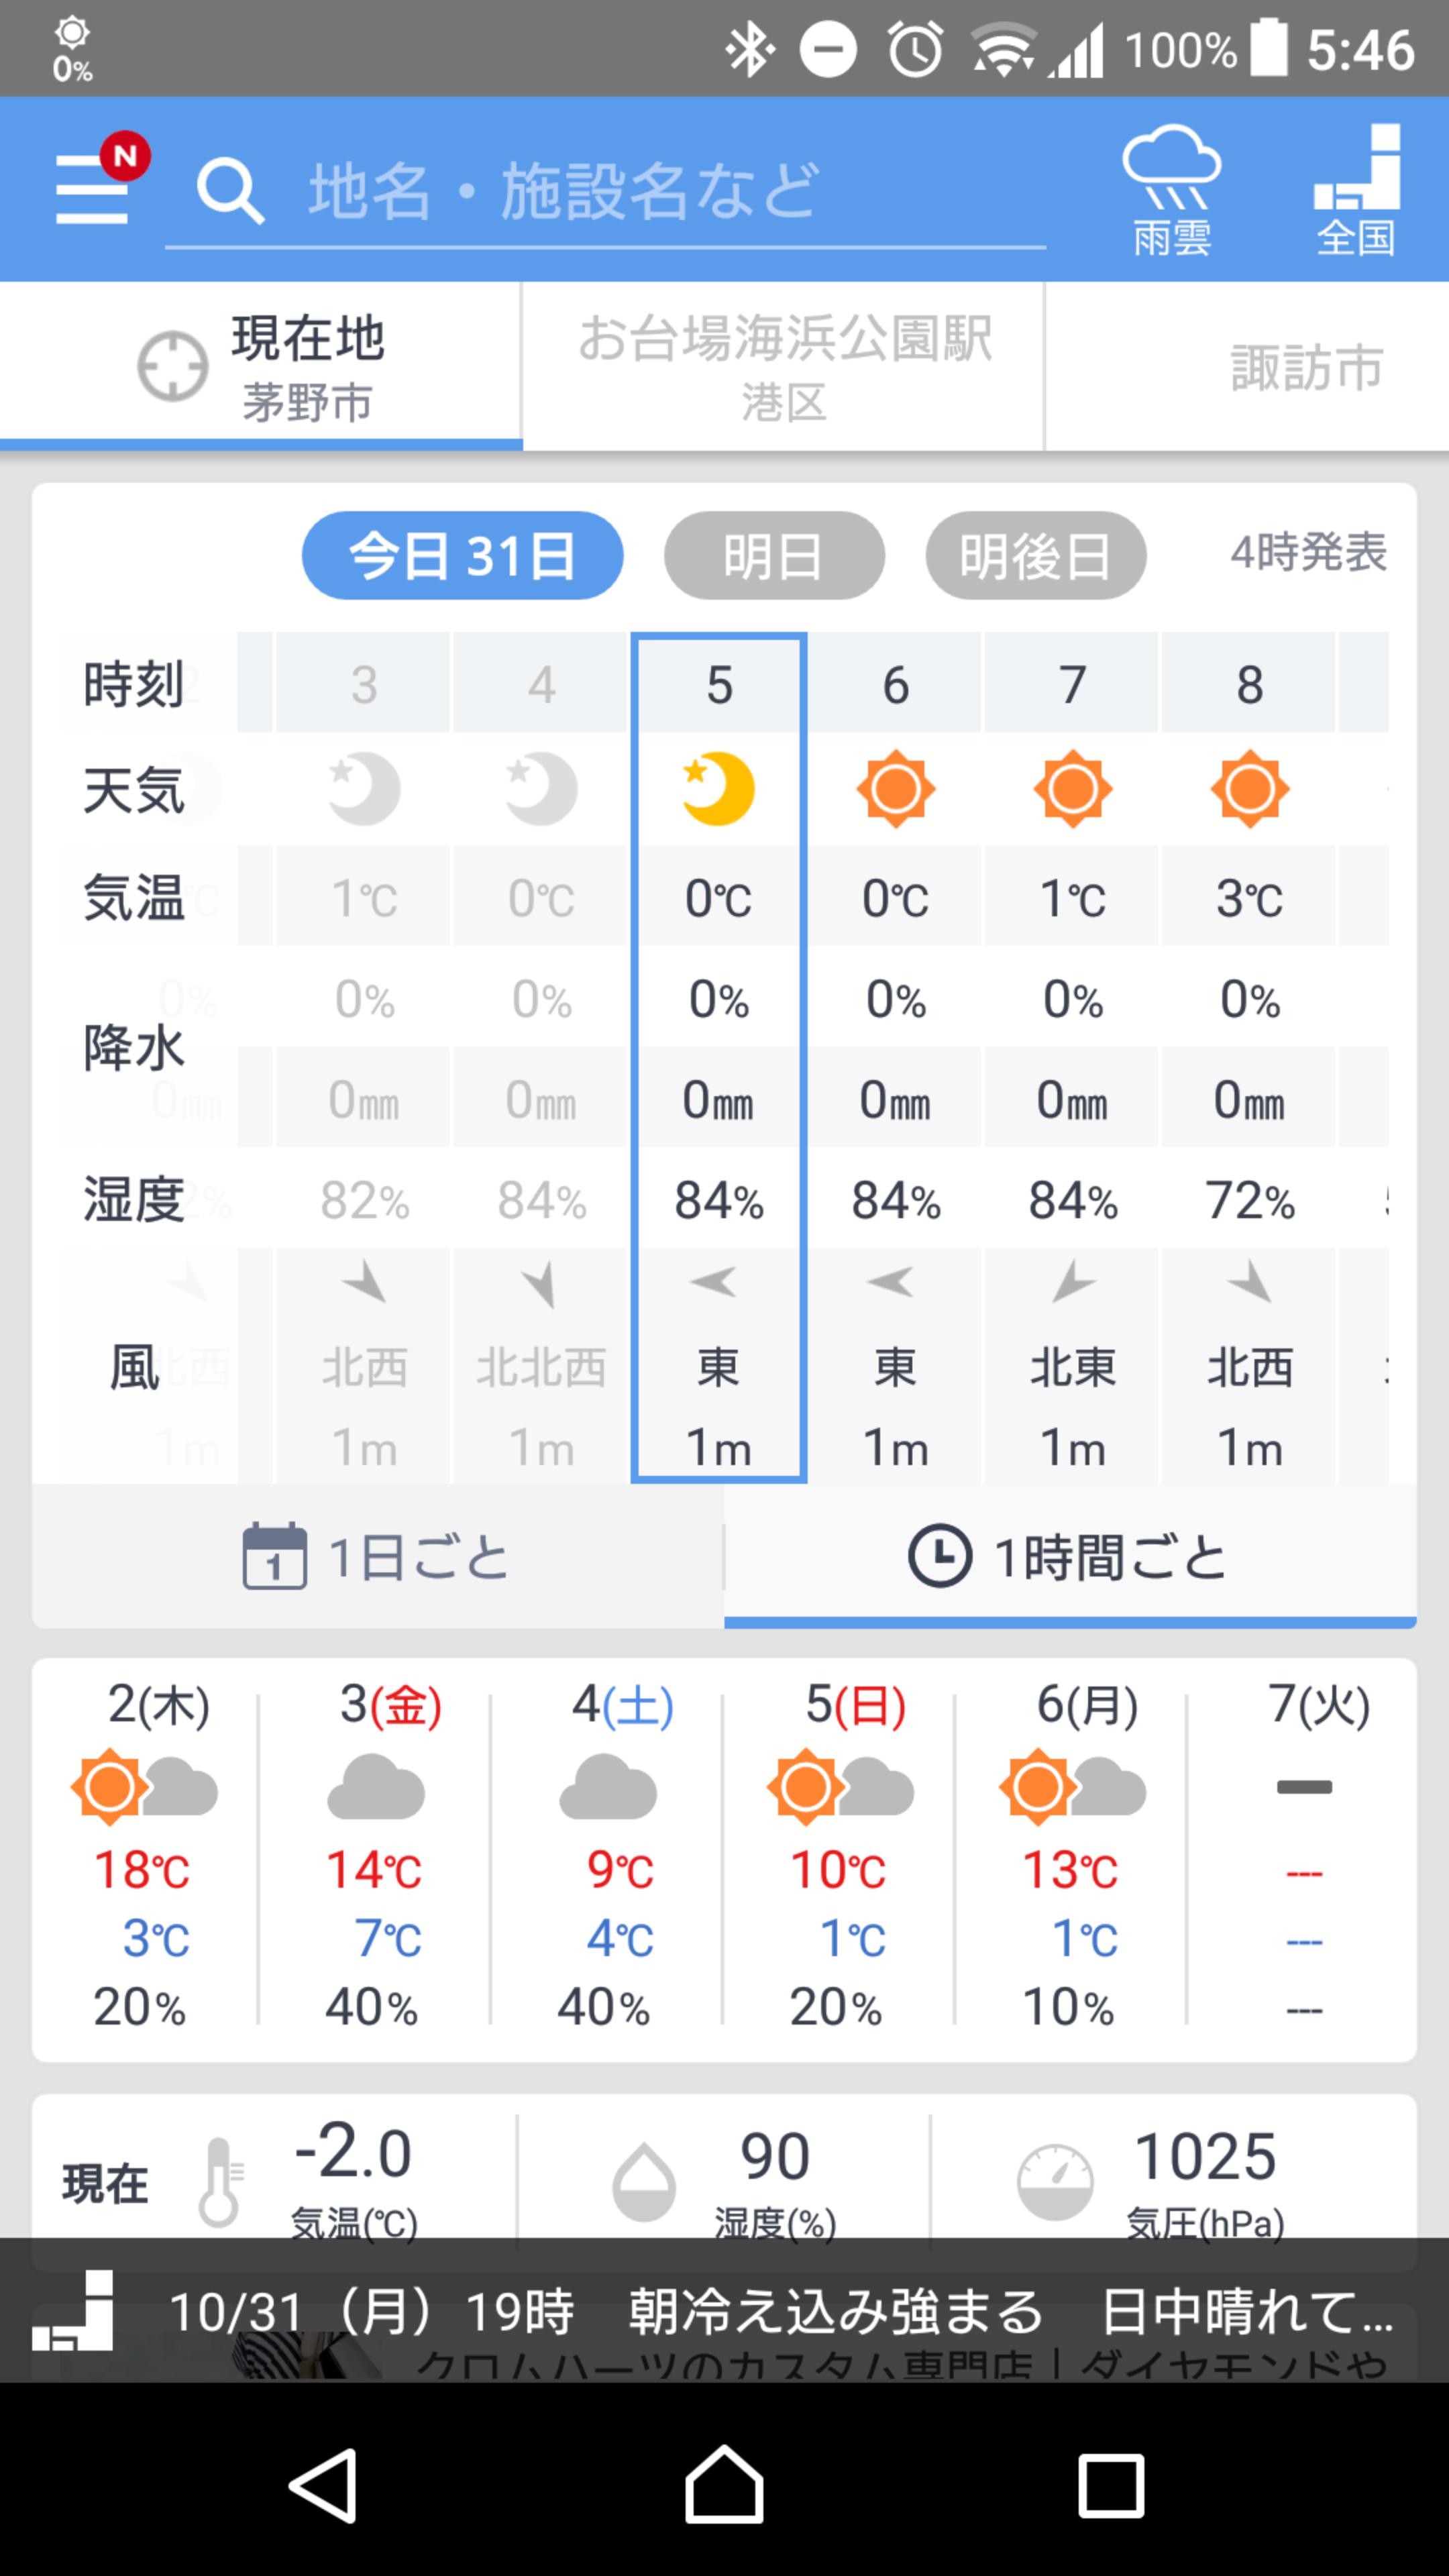 Screenshot_20171031-054610.png